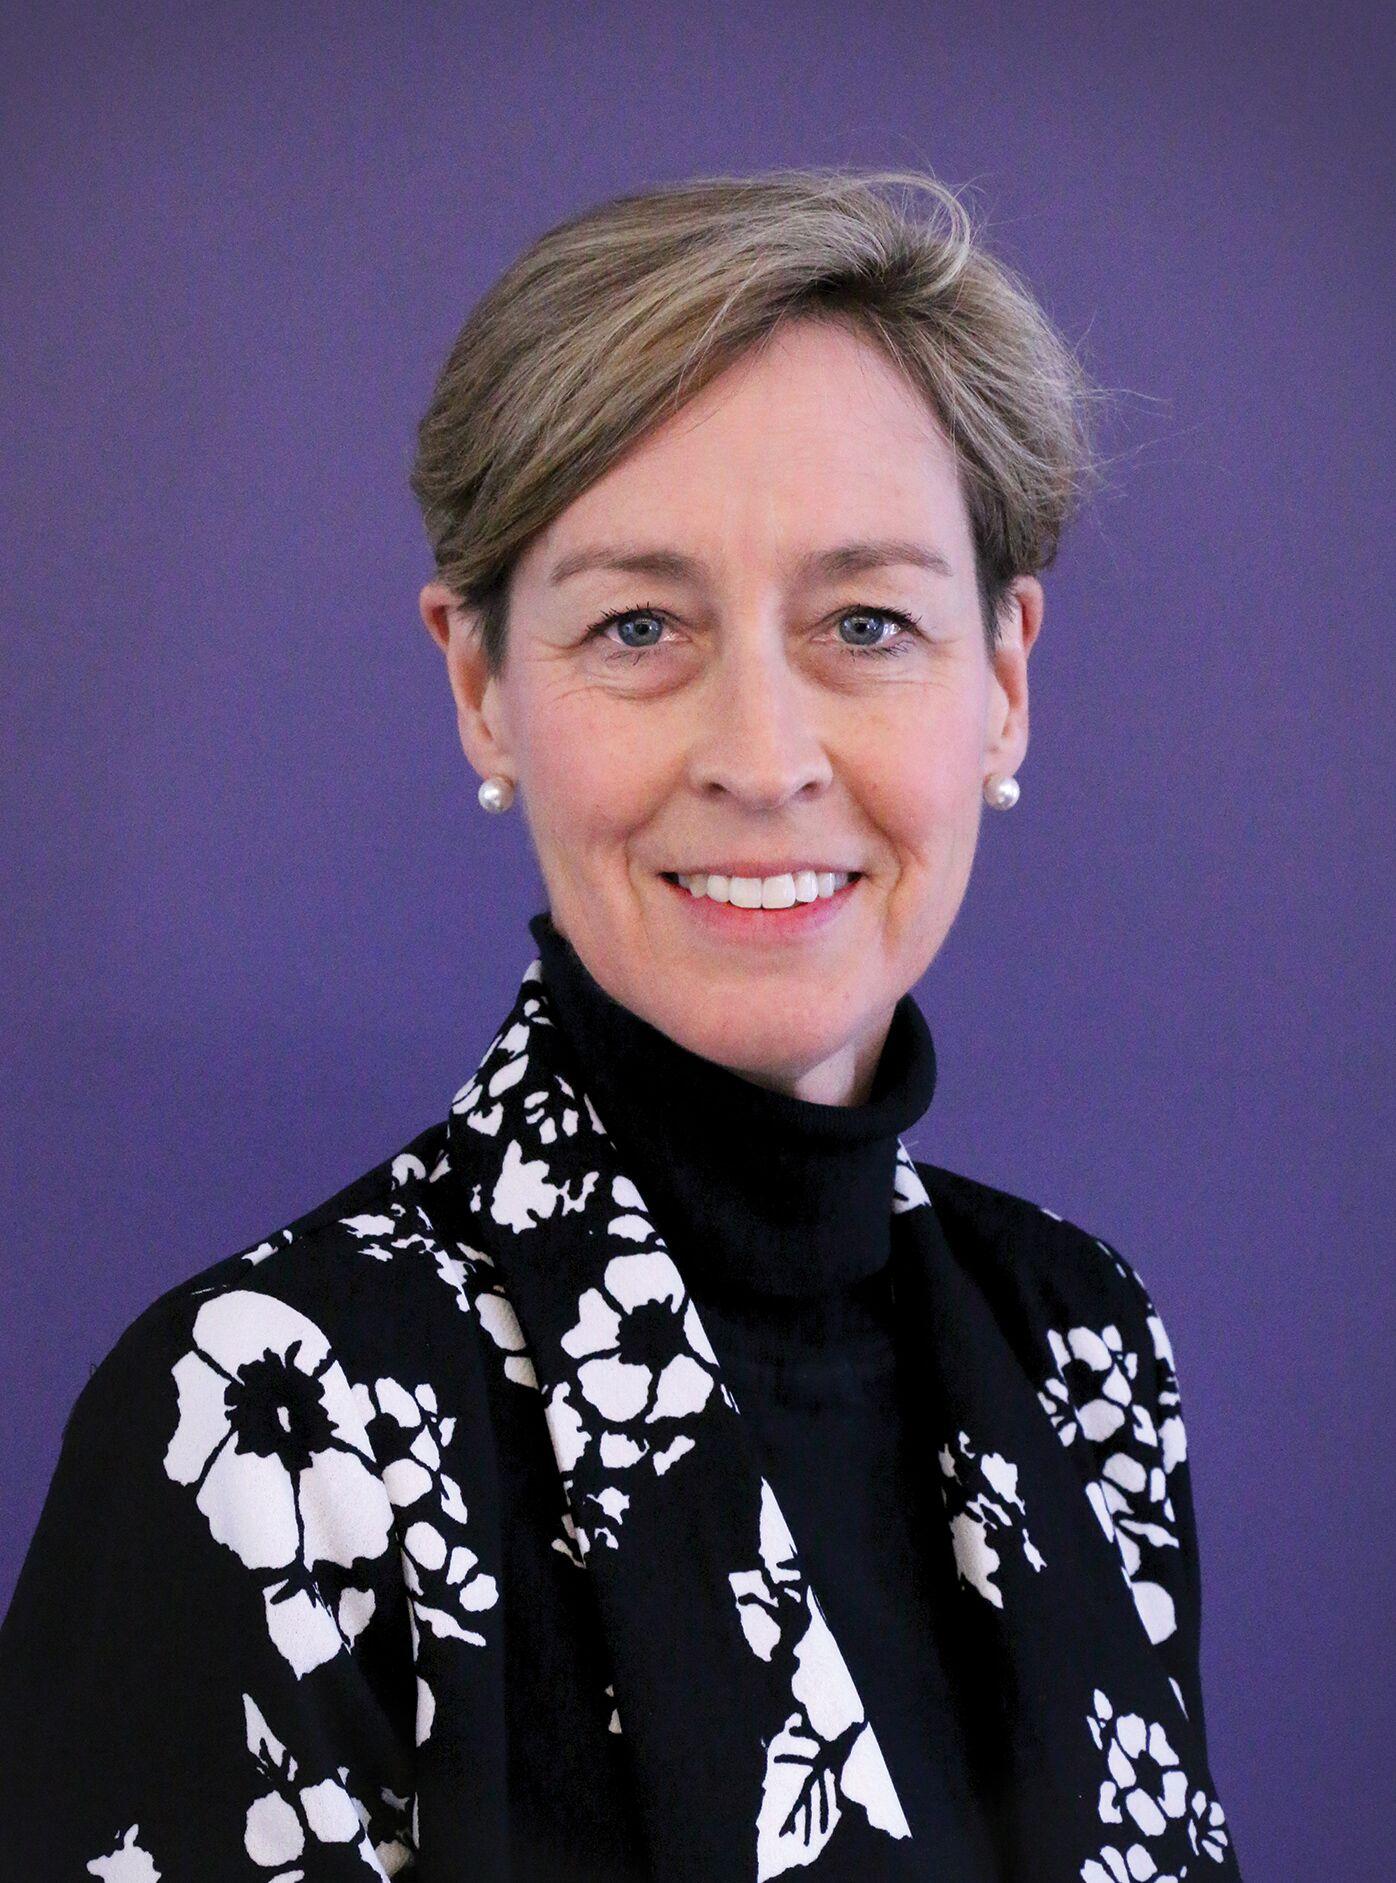 Christine Trauttmansdorff